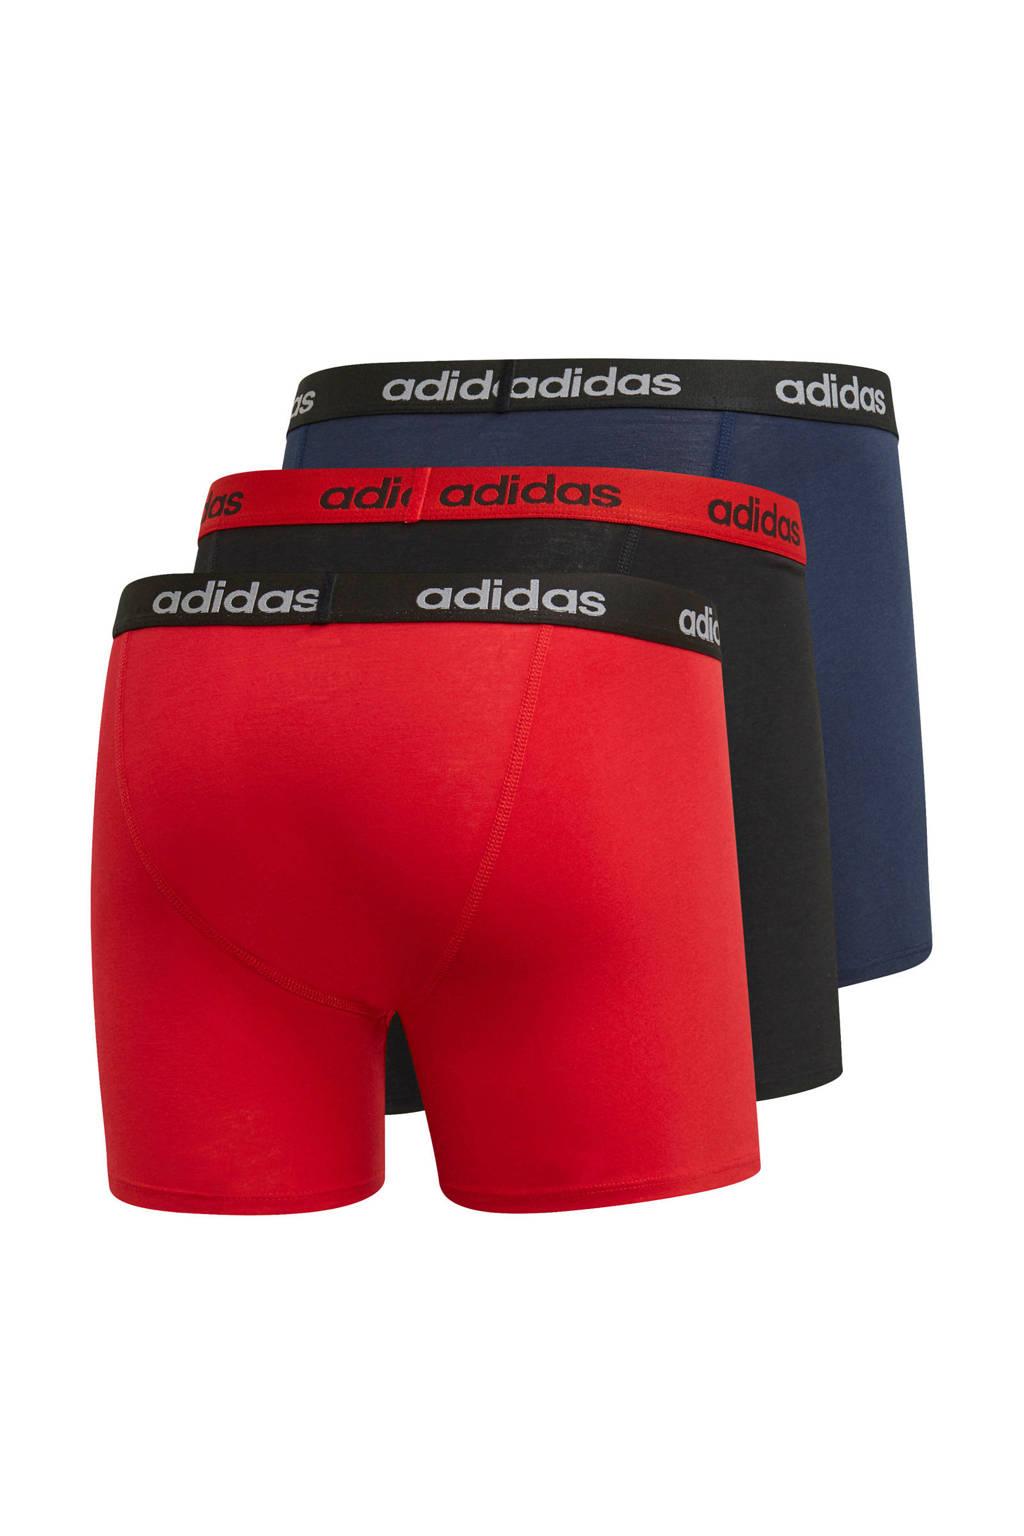 adidas sportboxer rood/zwart/donkerblauw (set van 3), Rood/zwart/donkerblauw